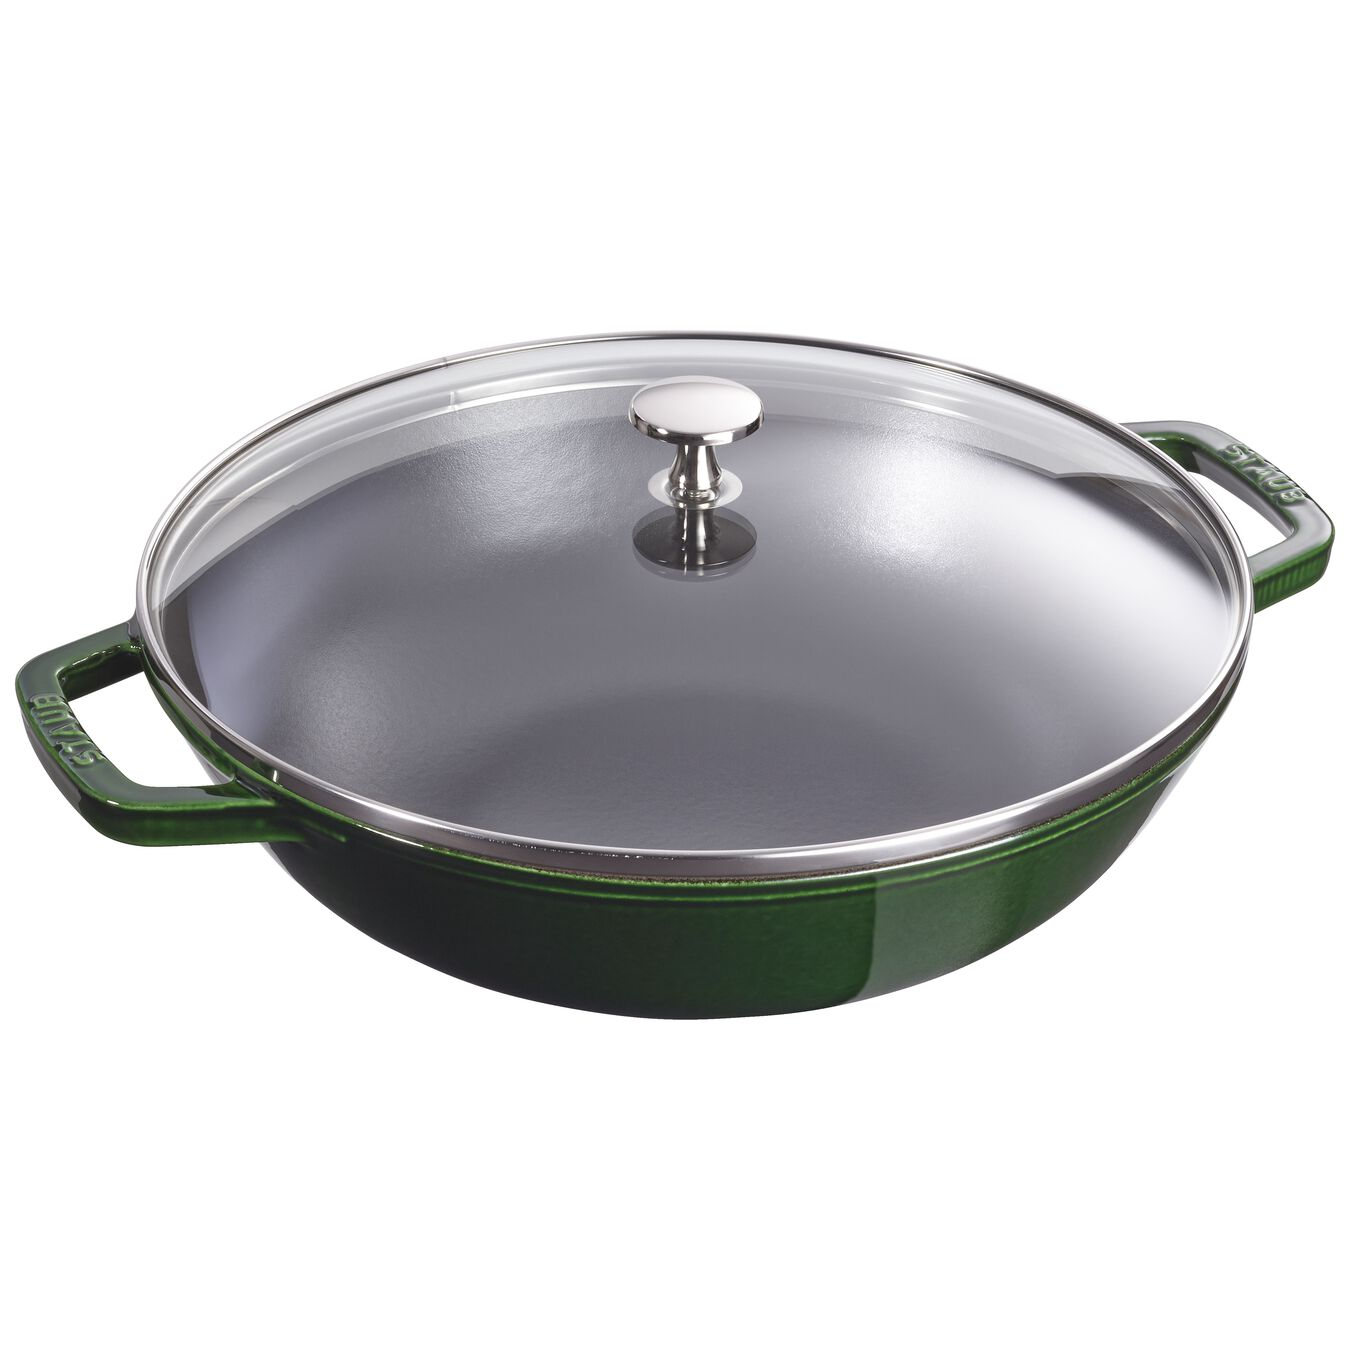 4.5-qt Perfect Pan - Basil,,large 1